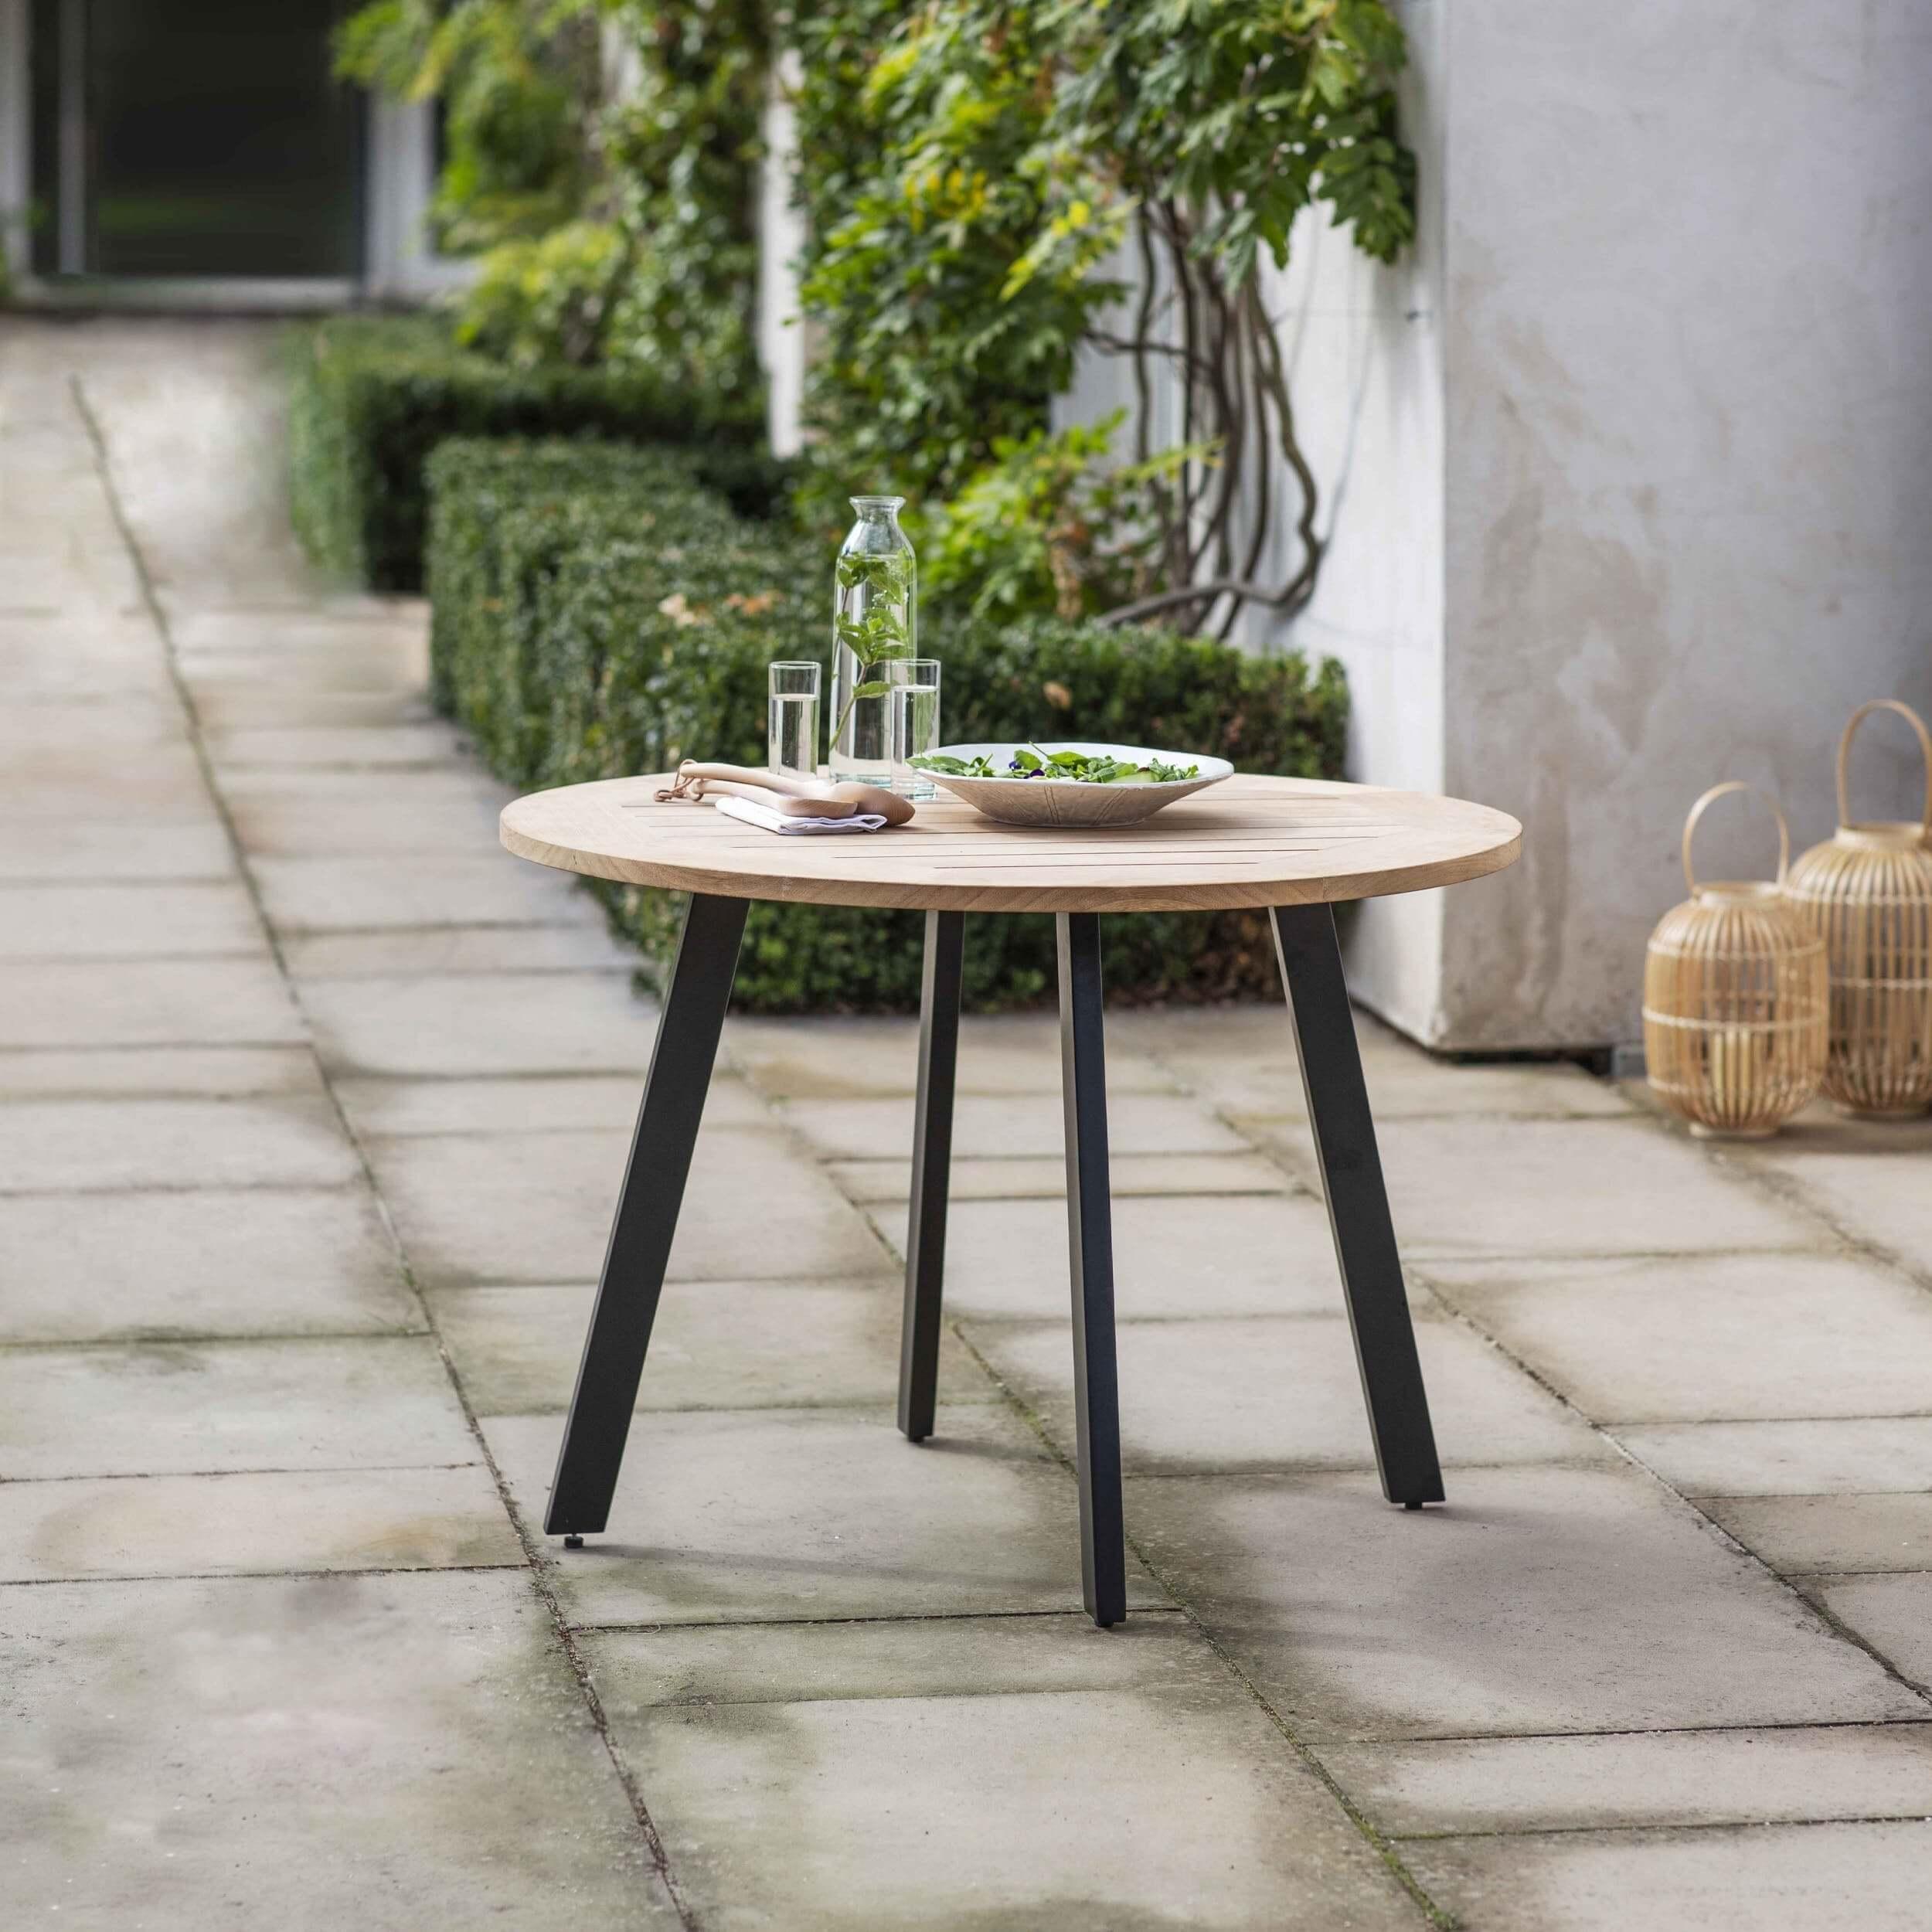 Kernow Round Table